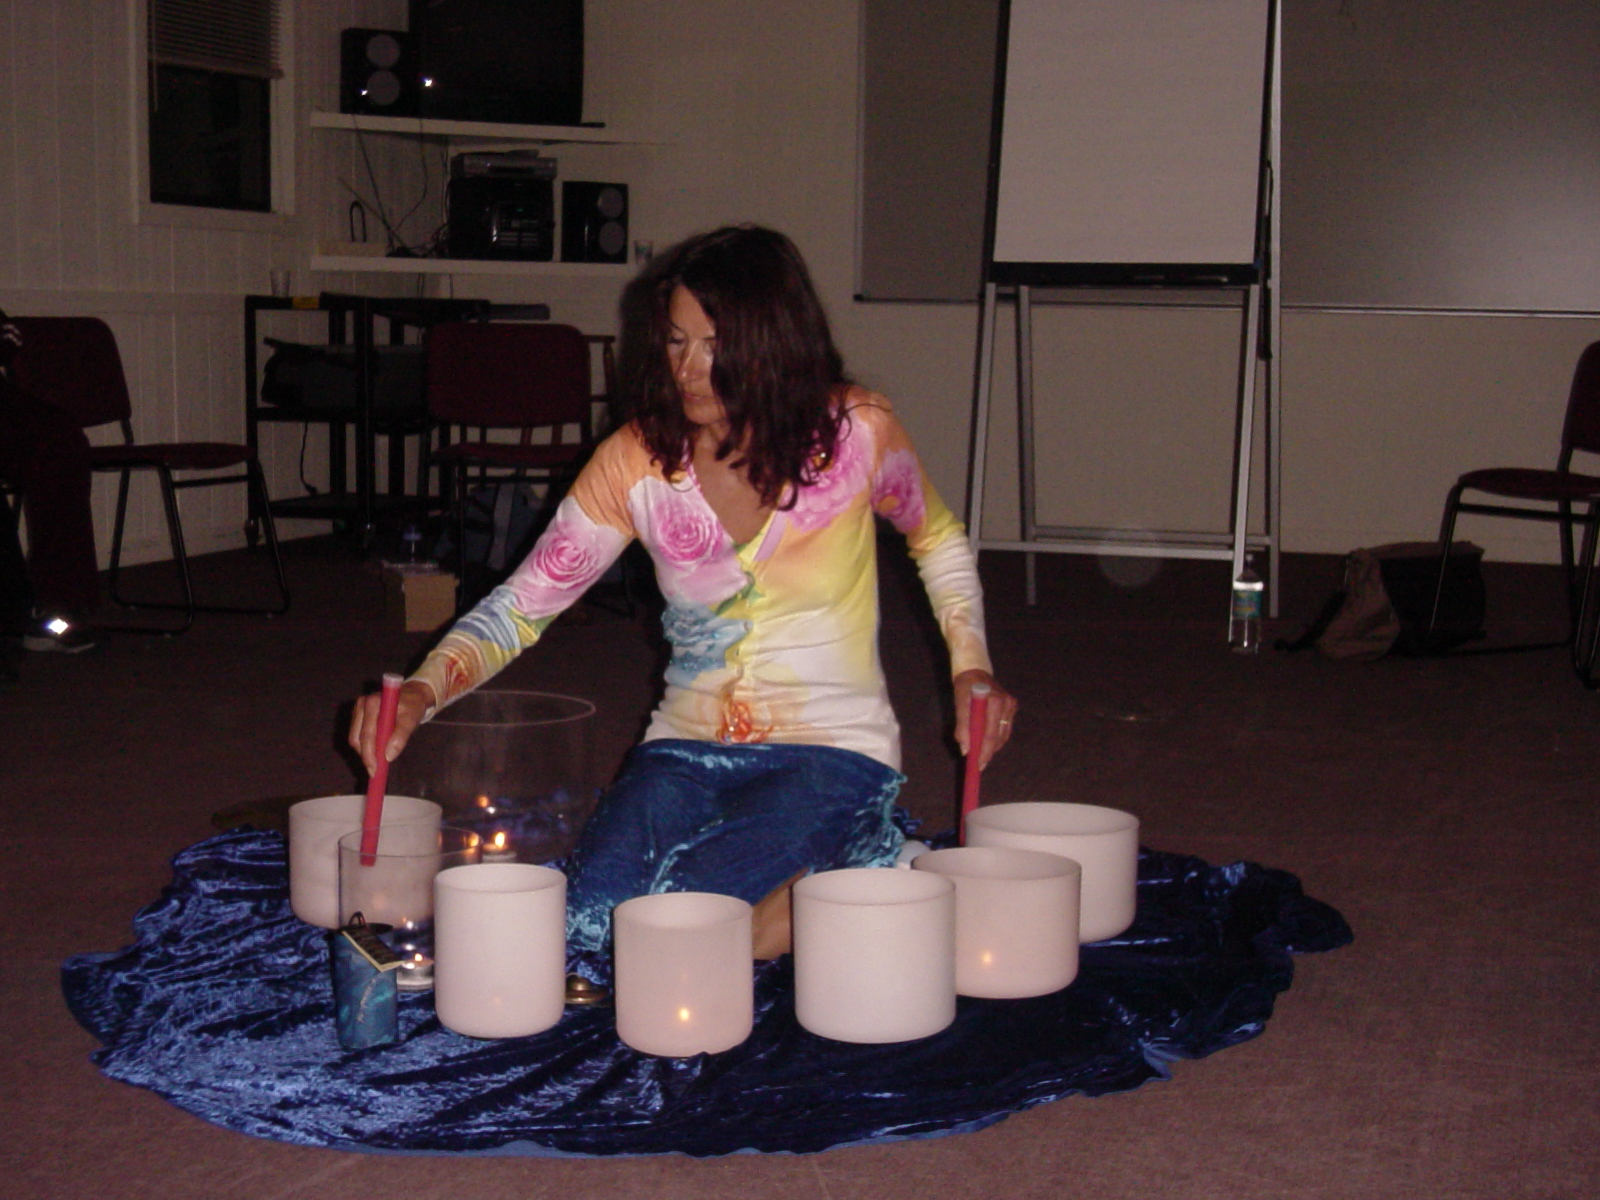 sara's photos of jan 2006 retreat brigitte2.jpg